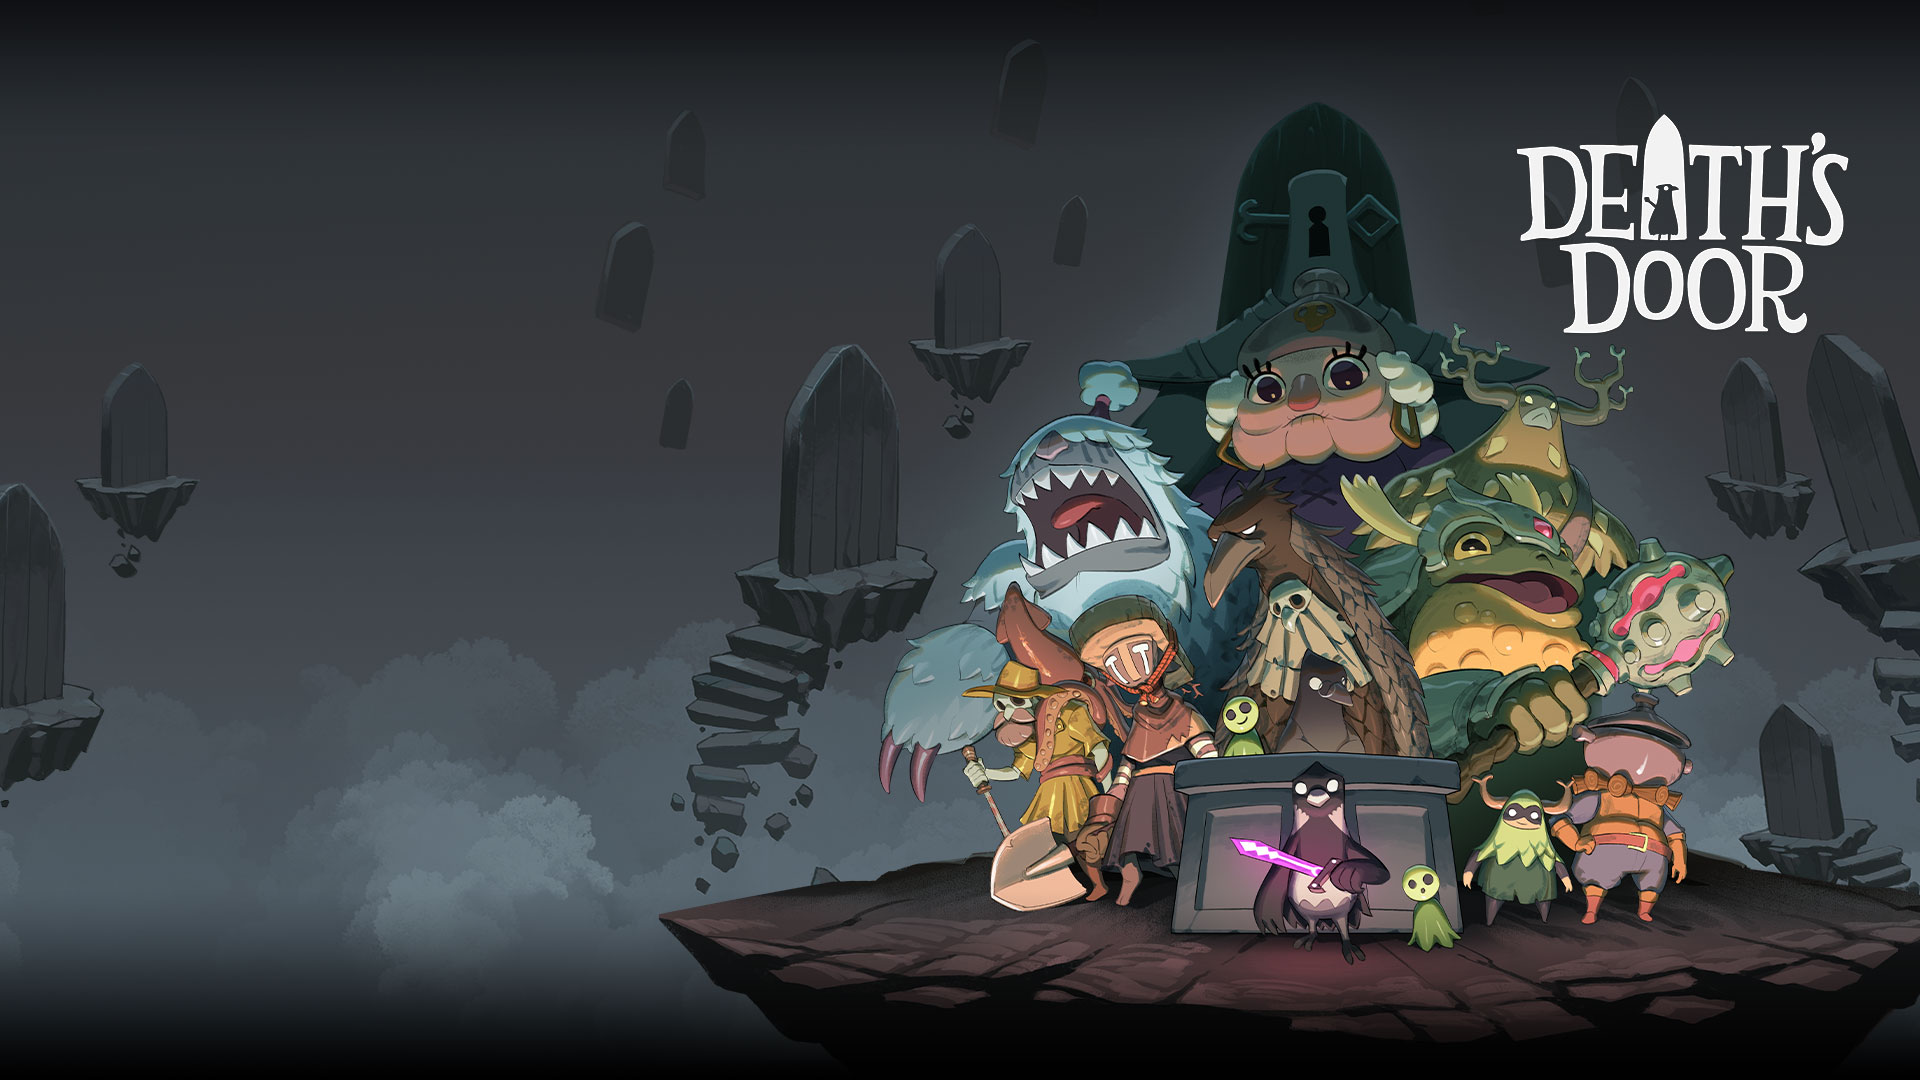 تریلر بازی Death's Door